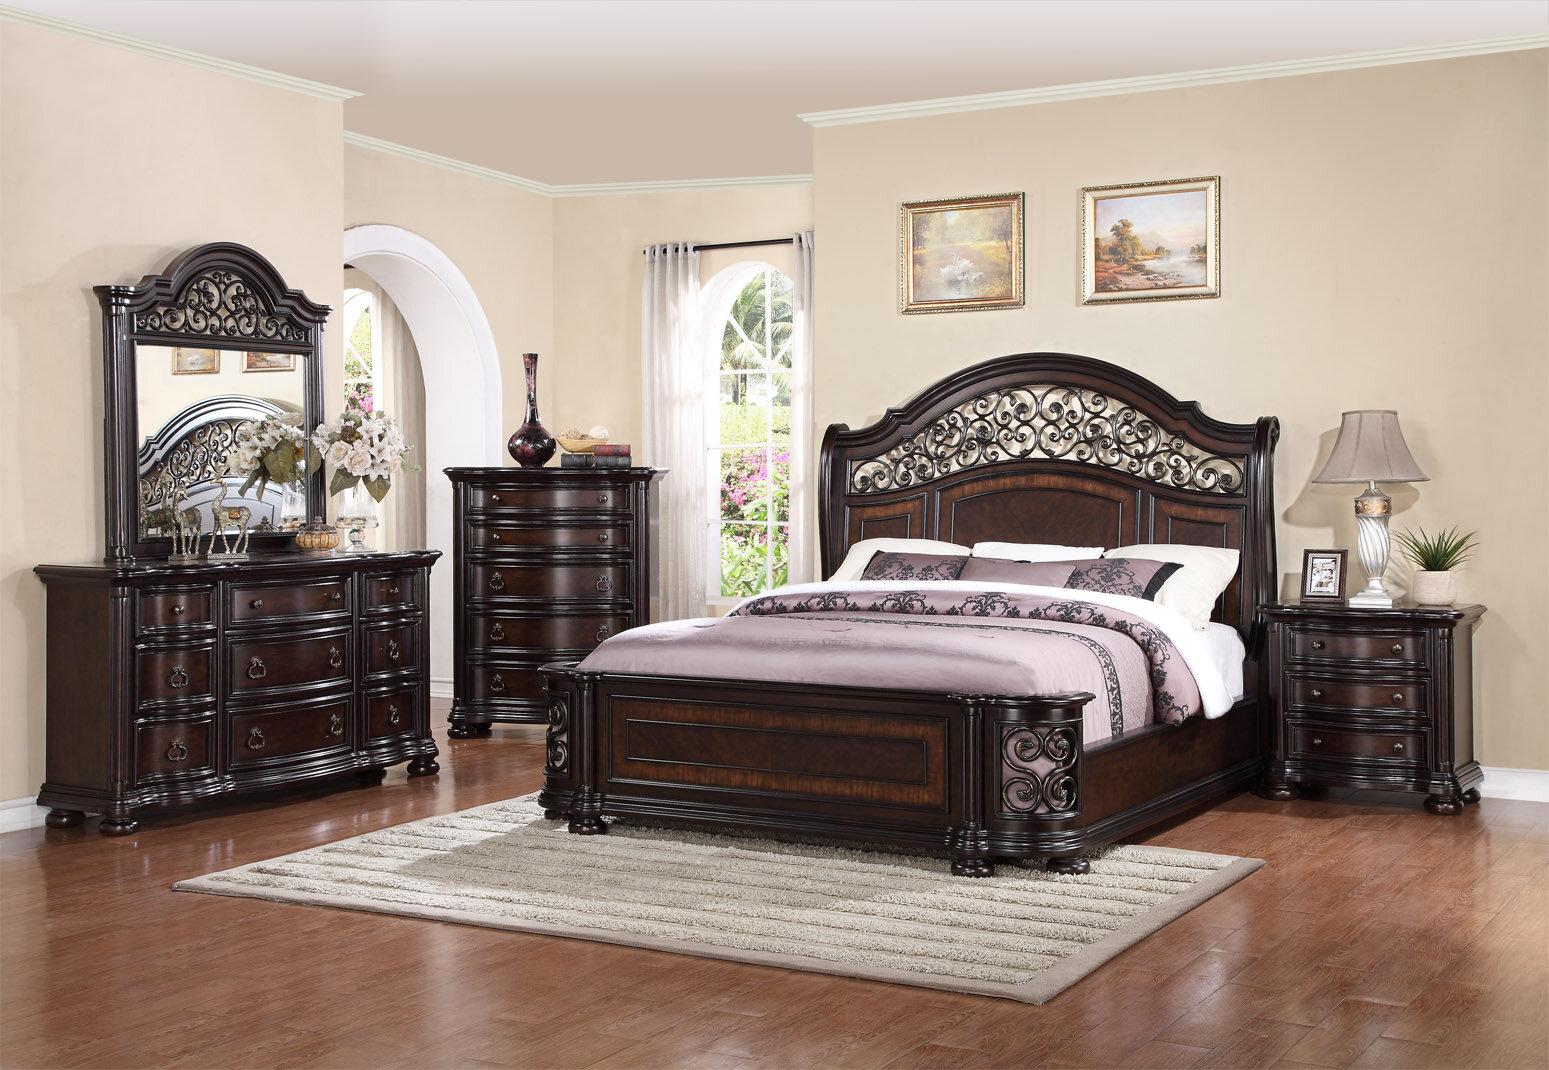 Kelsey Traditional Luxury Queen Poster Bed 4 piece Cherry Bedroom Furniture  Set